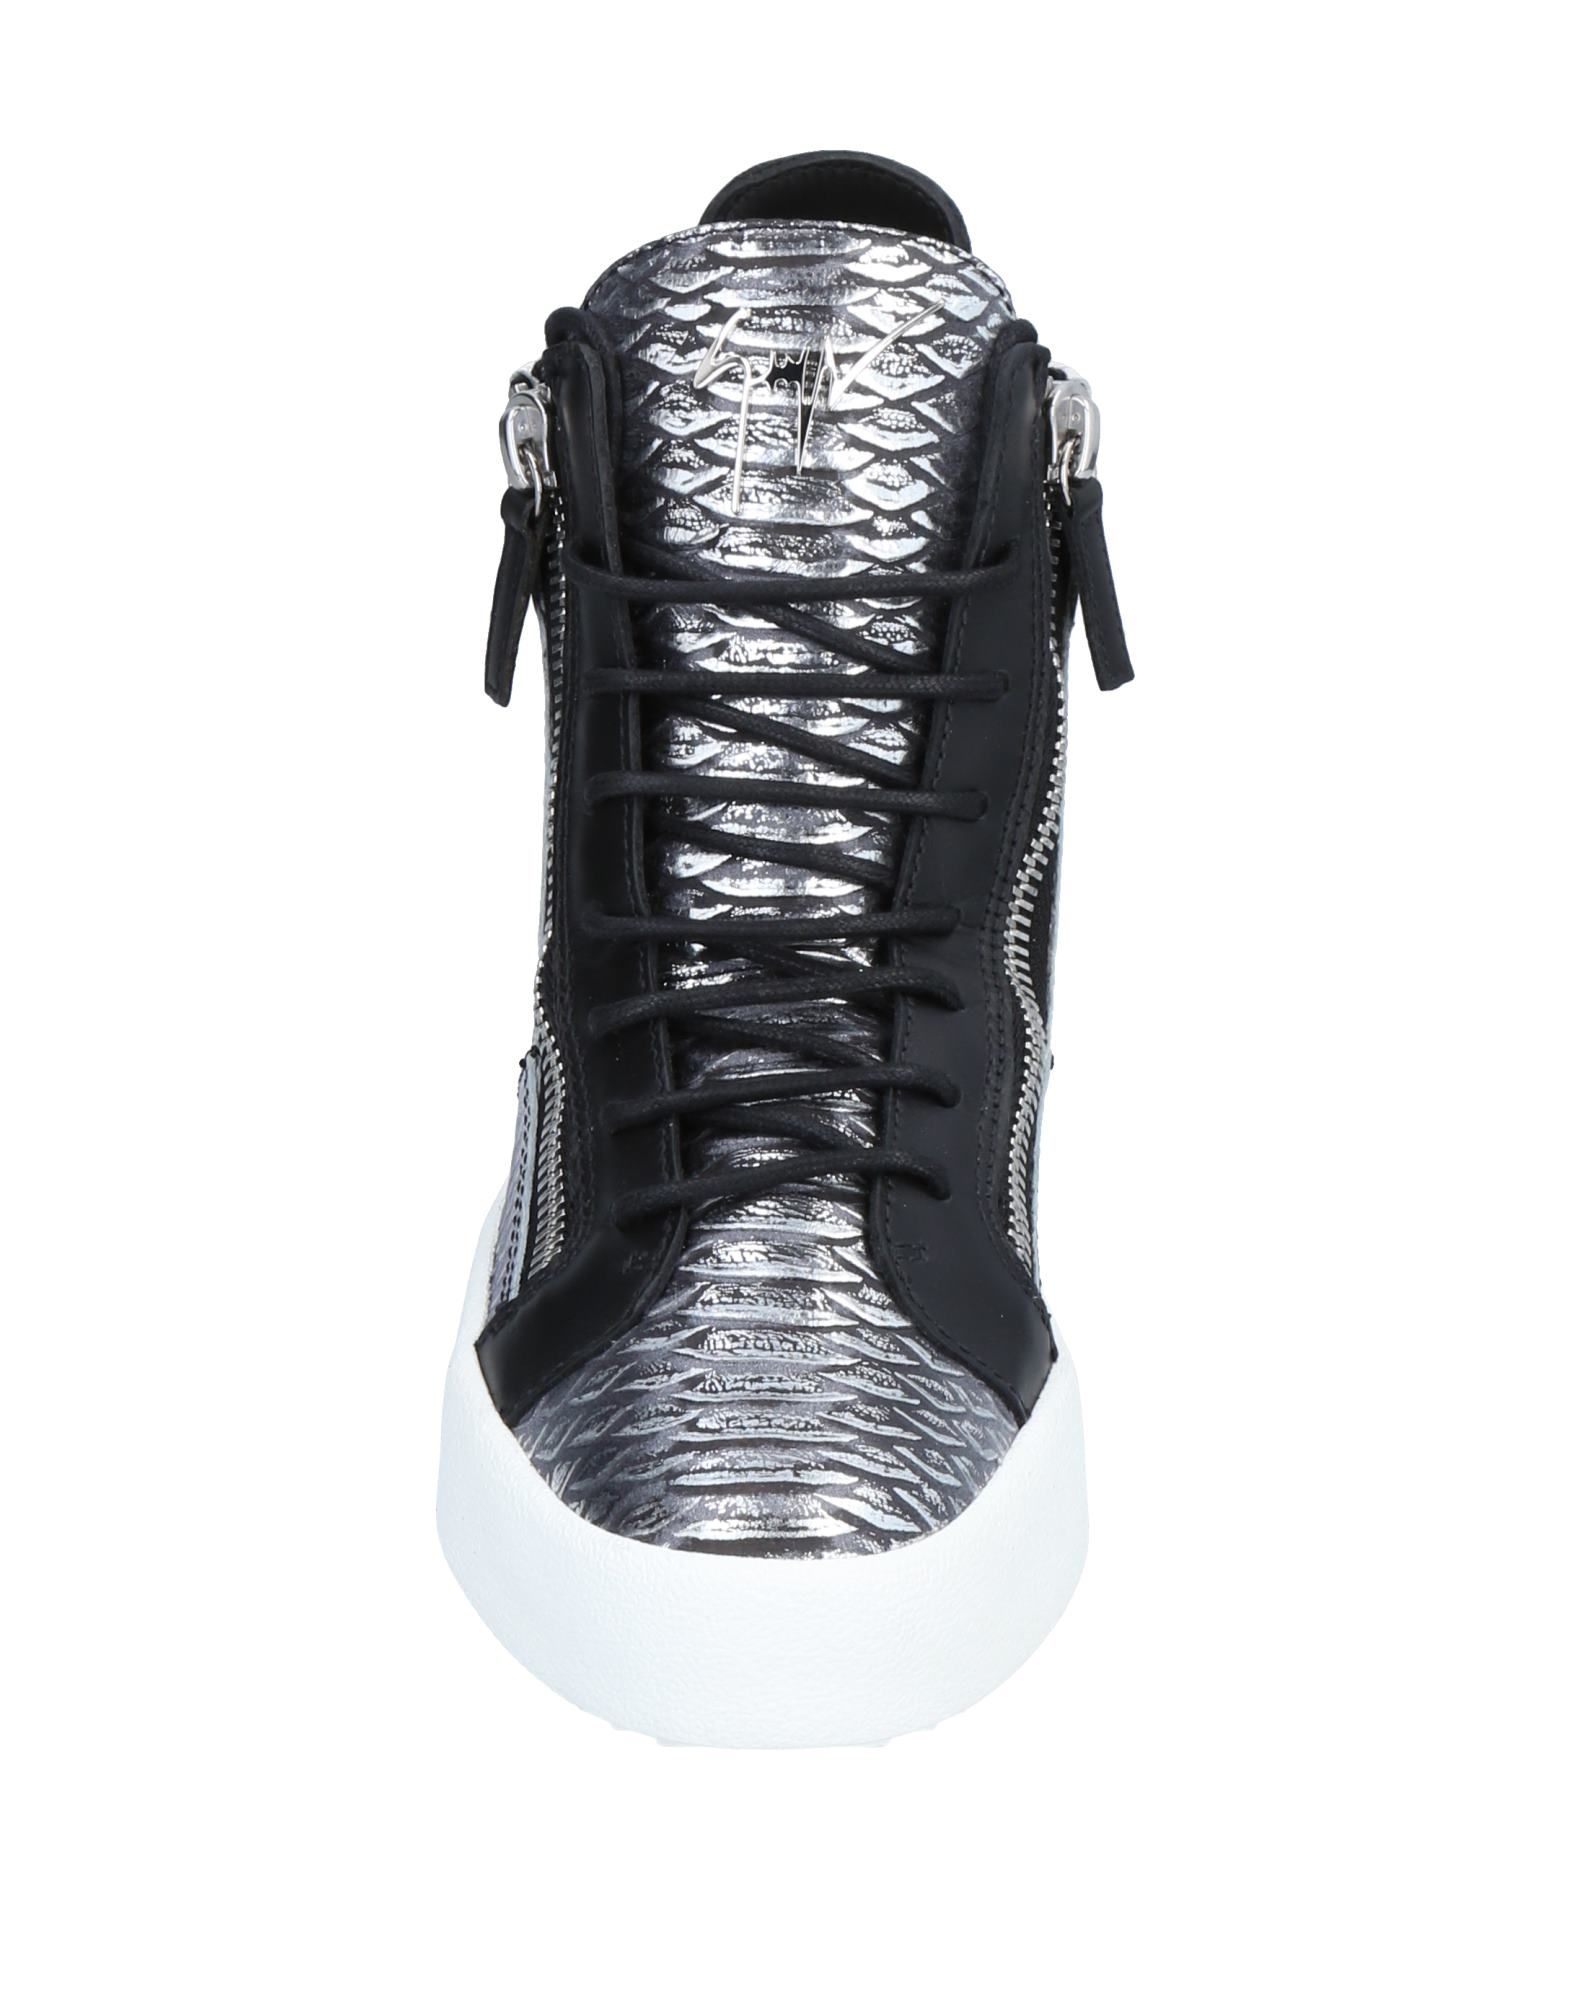 Giuseppe Zanotti Sneakers Herren beliebte  11544521PR Gute Qualität beliebte Herren Schuhe f14a84